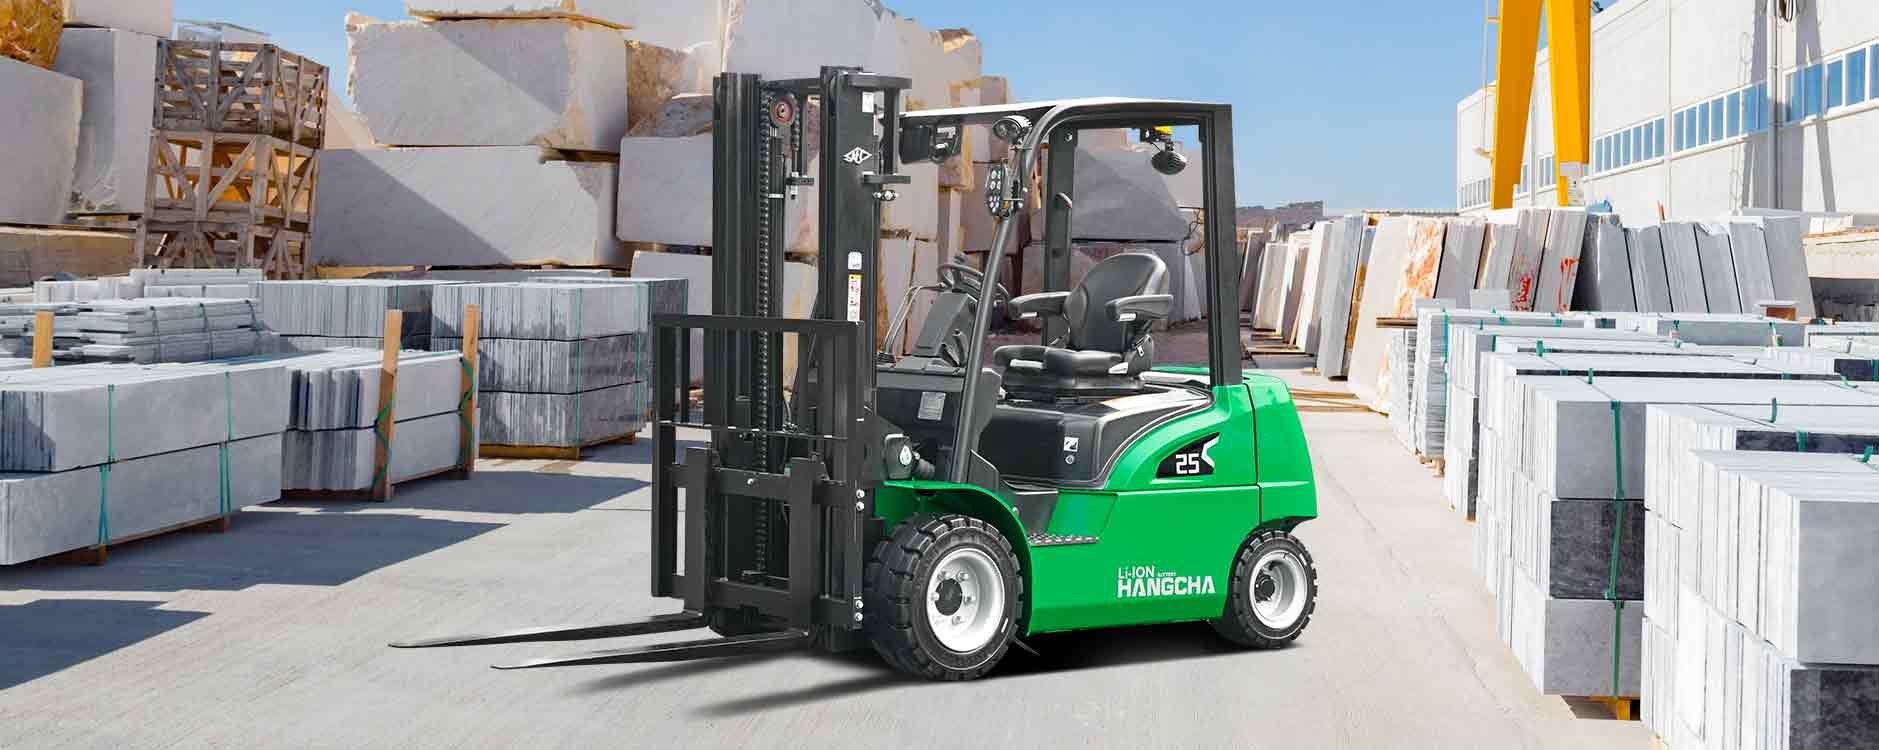 New, 2021, HC Forklift (HANGCHA), FB25Li, Forklifts / Lift Trucks